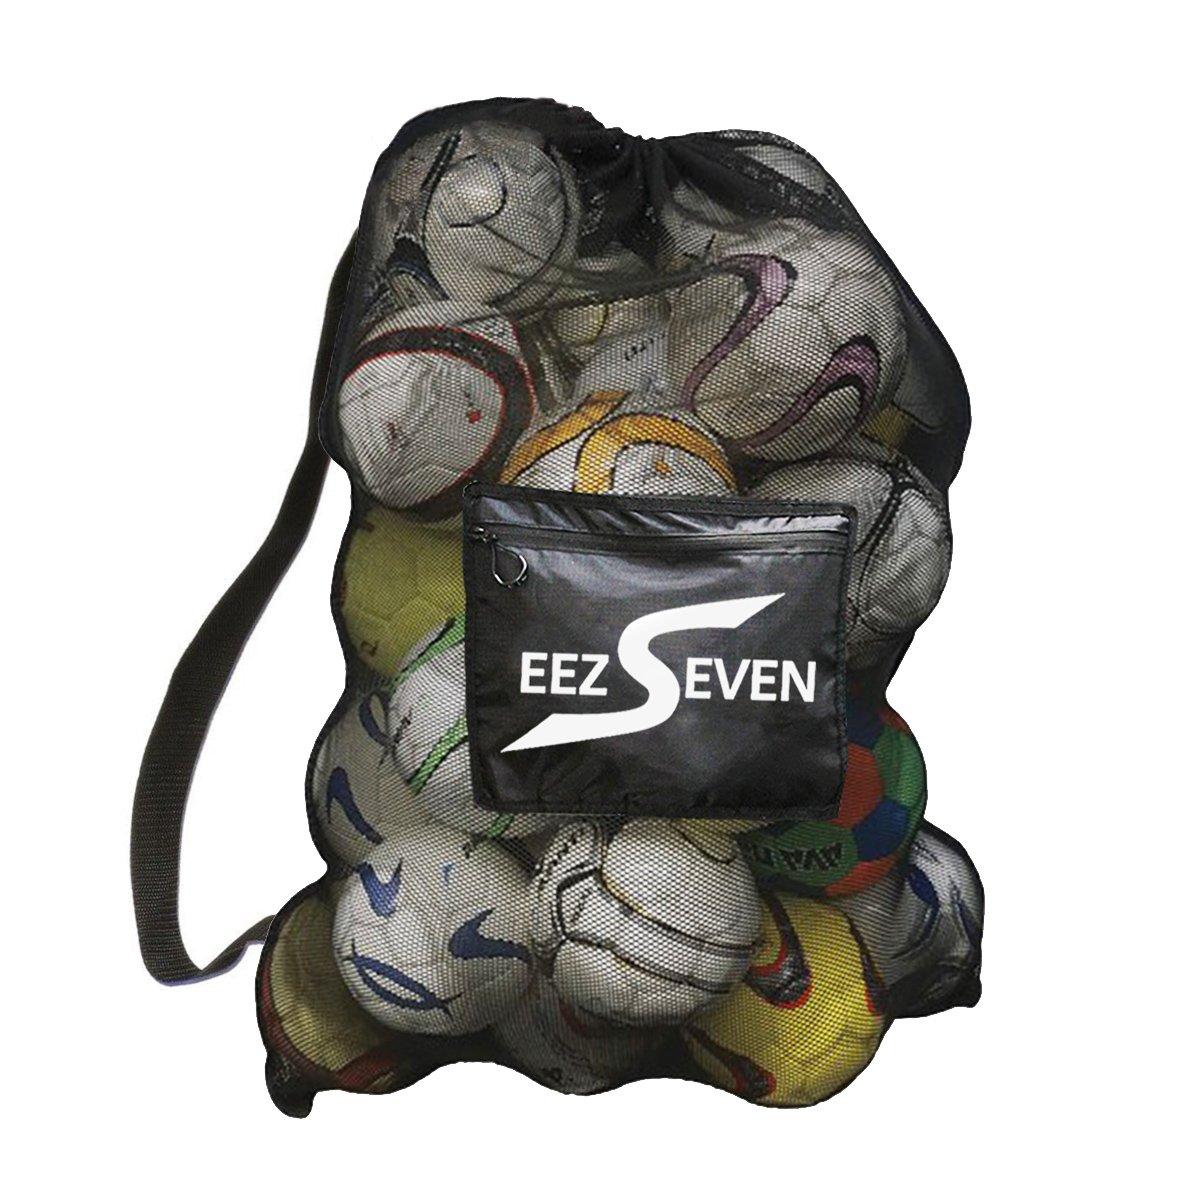 fd933b4ab622 Heavy Duty Extra Large Ball Mesh Bag Soccer Ball Bag Equipment Bag For  Sports Beach and